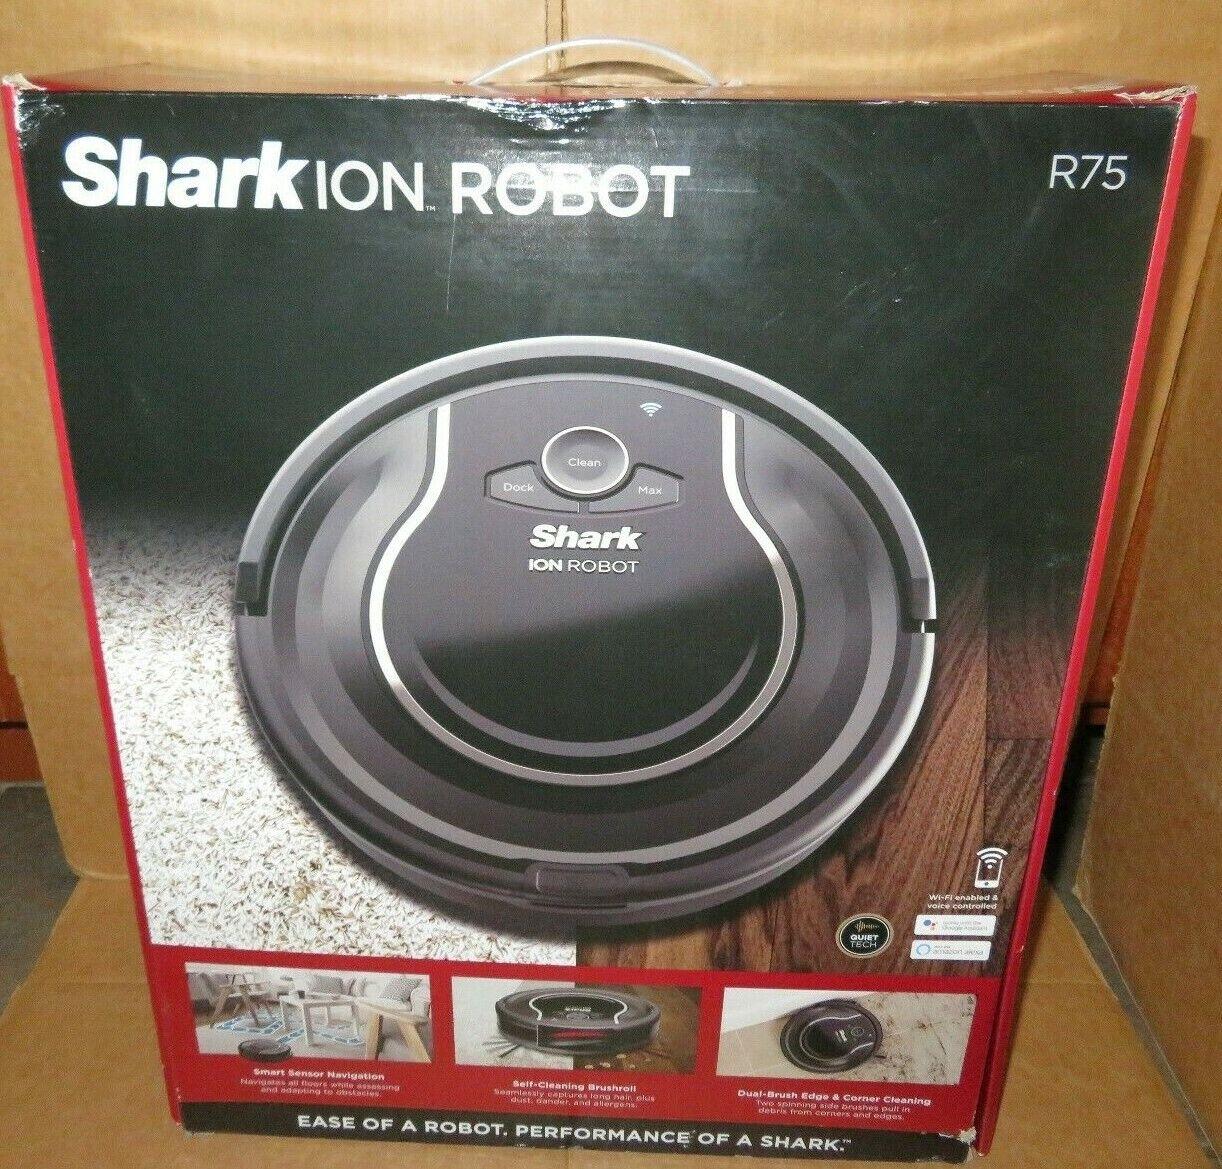 Shark - ION ROBOT 750 App-Controlled Robot Vacuum - Gray